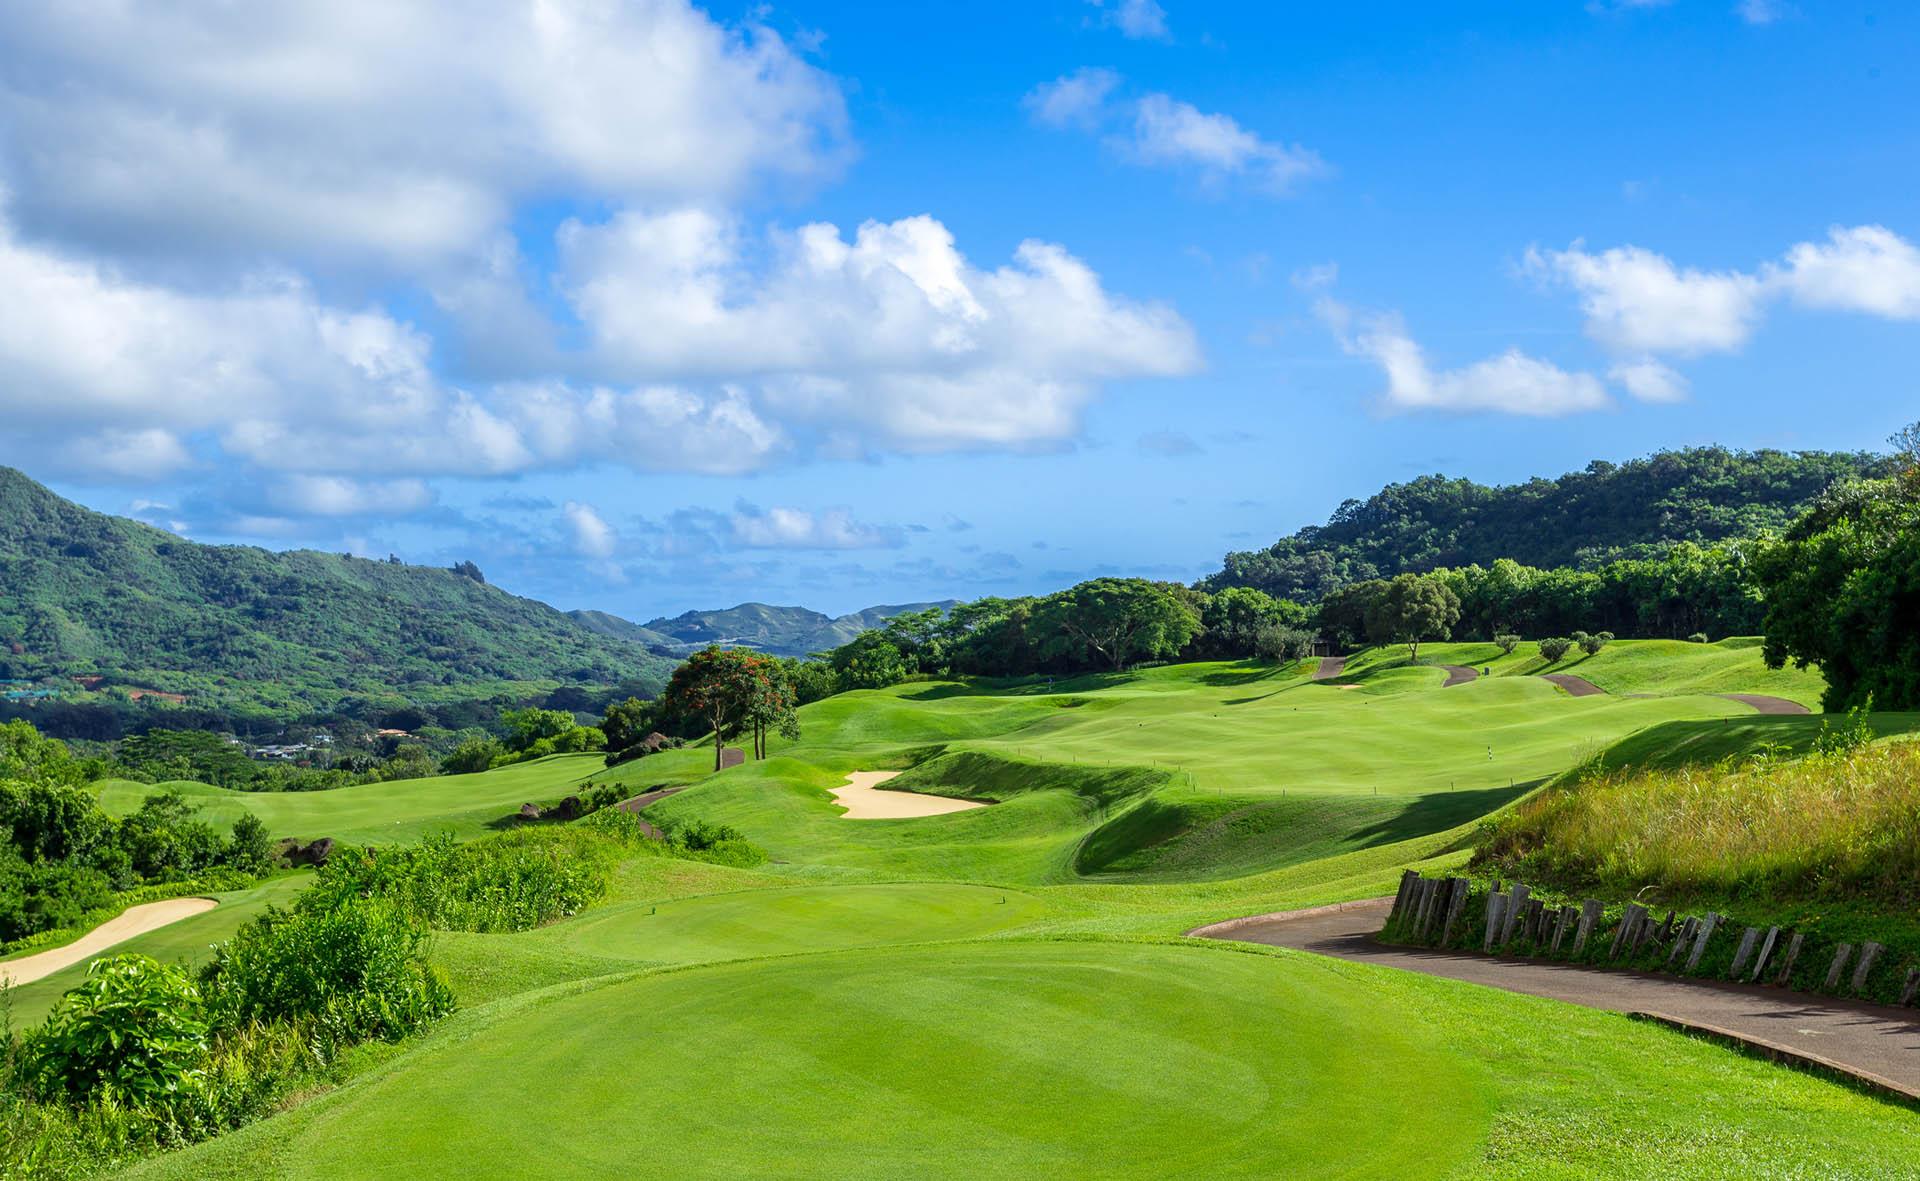 https://bubo.sk/uploads/galleries/16052/royal-hawaiian-golf-club_next-golf-1.jpg